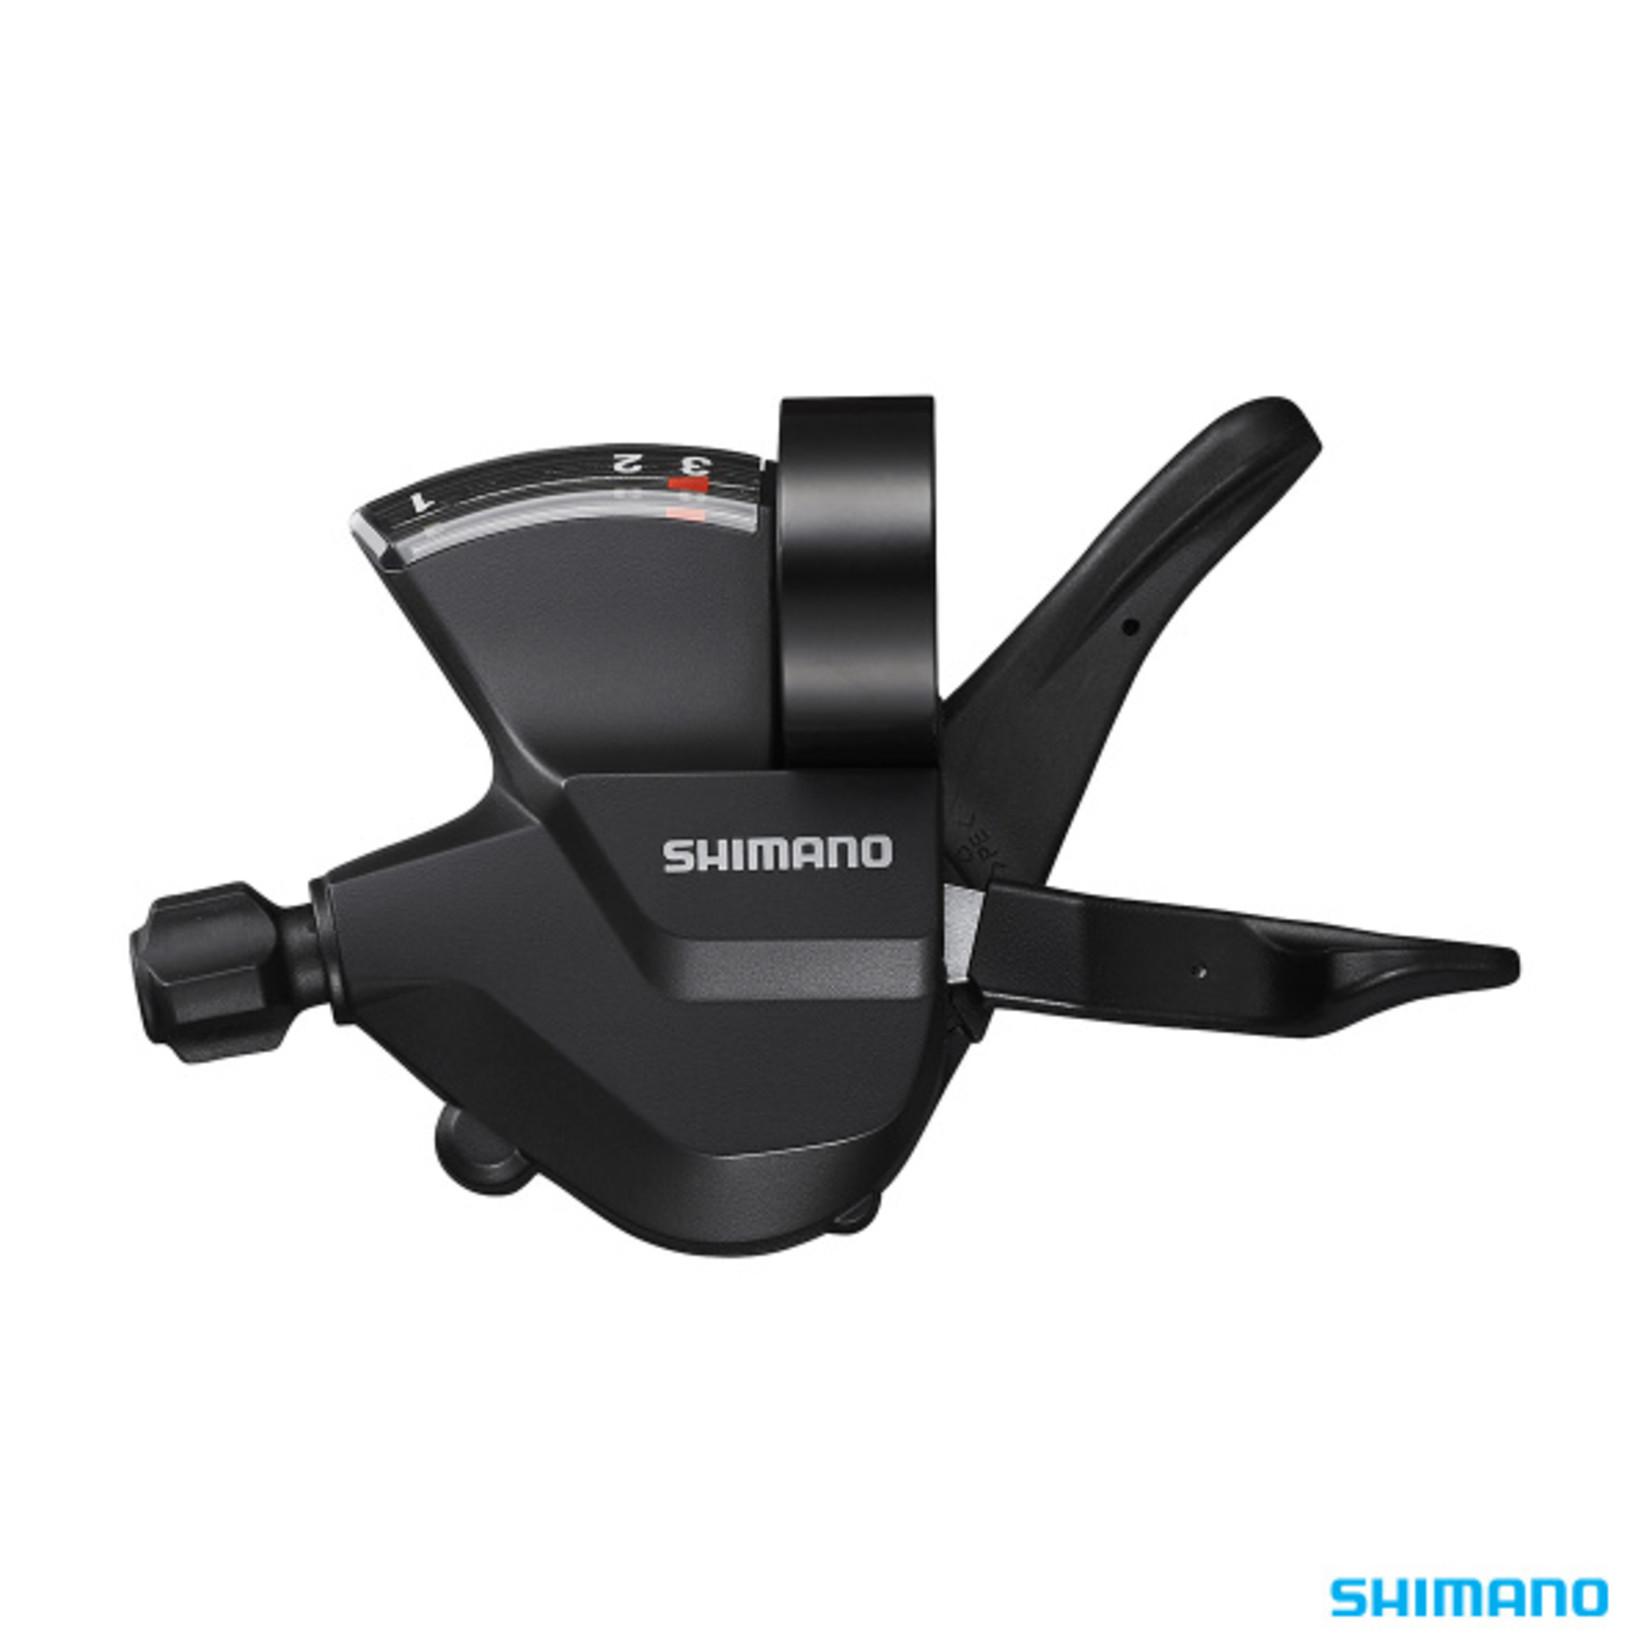 Shimano Shimano, SL-M315 Rapidfire+ Lever Left 3-Speed